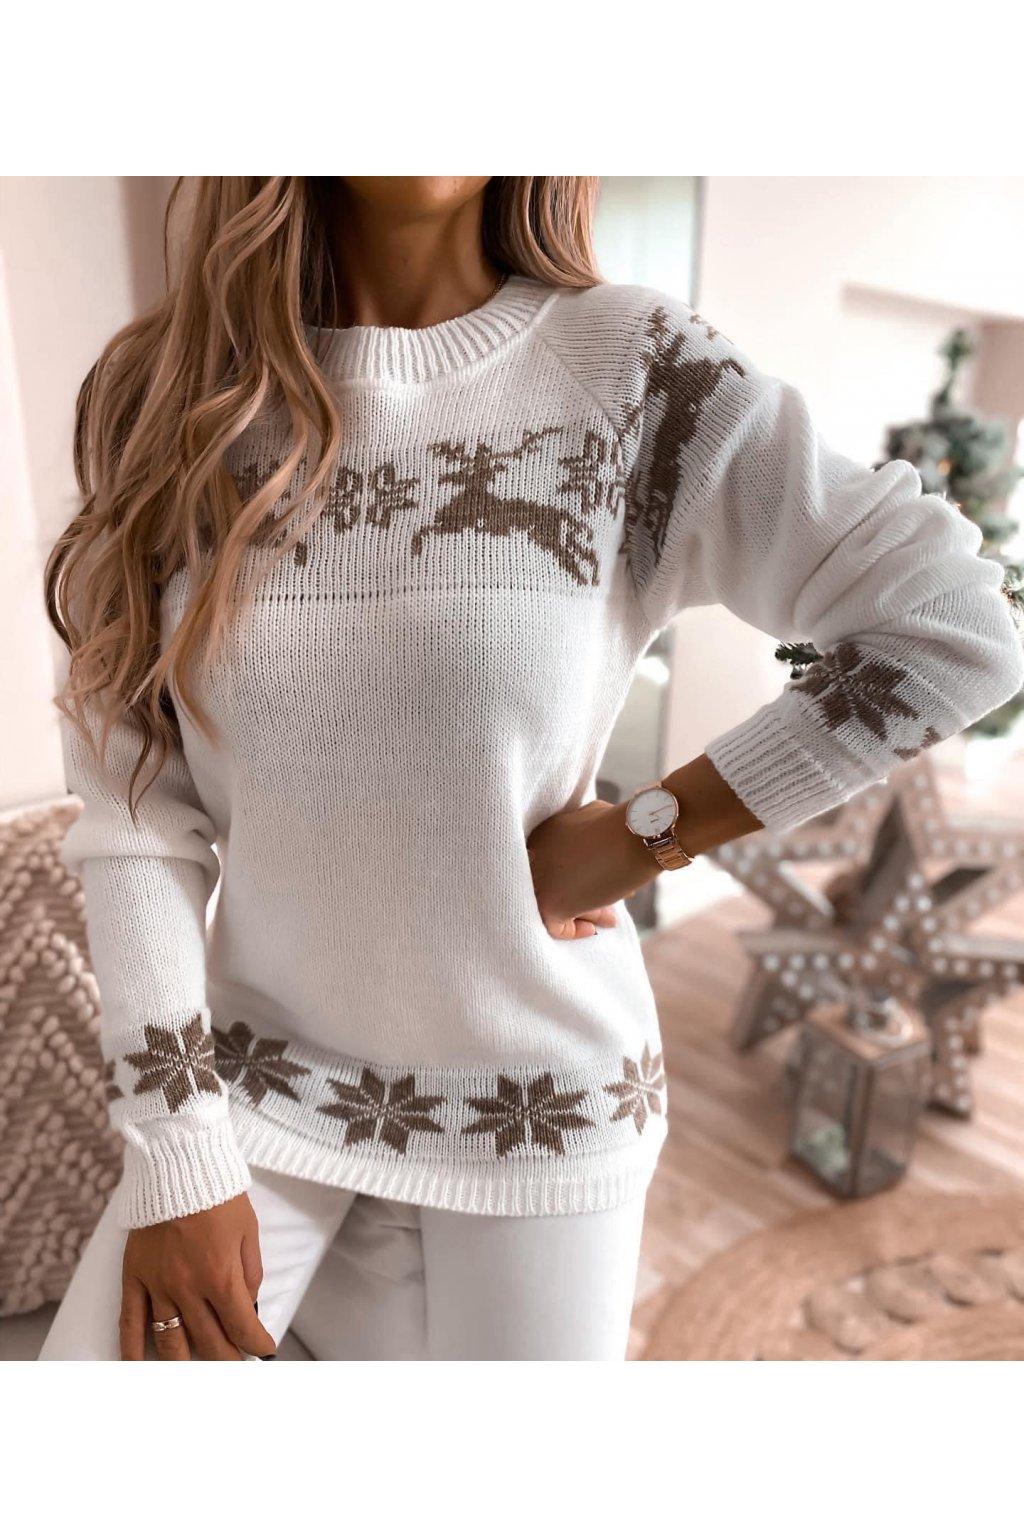 damsky svetr christmas reindeer white eshopat cz 1